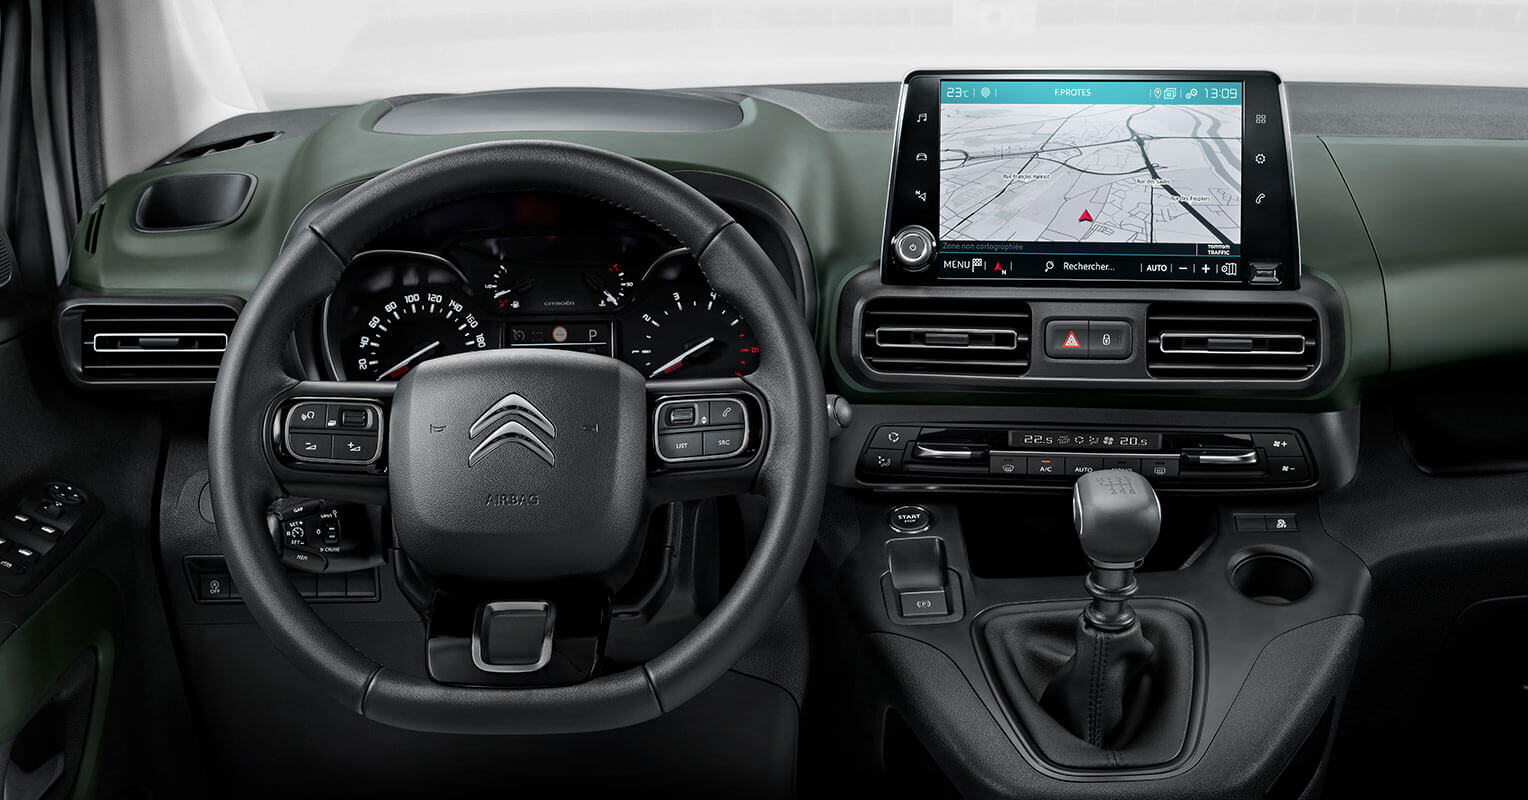 Citroën Berlingo 2018 interior